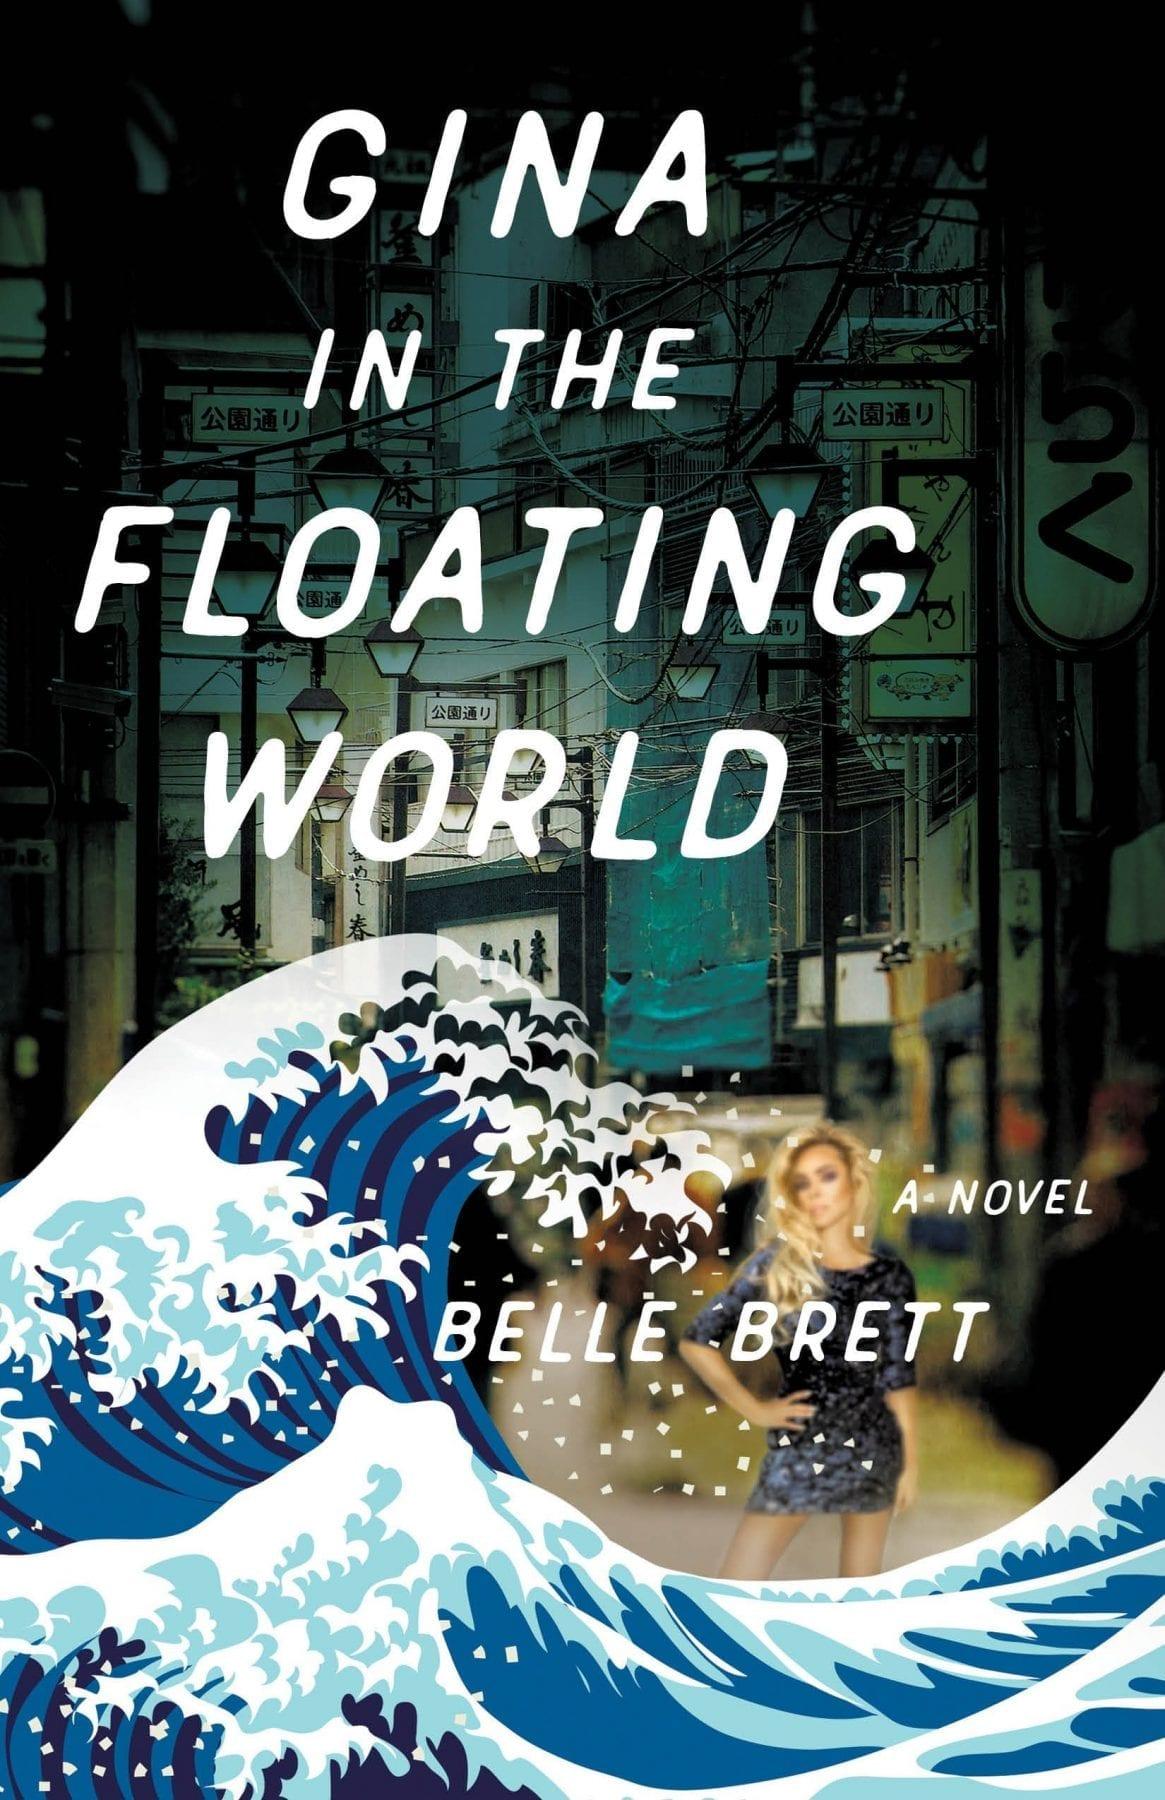 Gina in the Floating World by Belle Brett